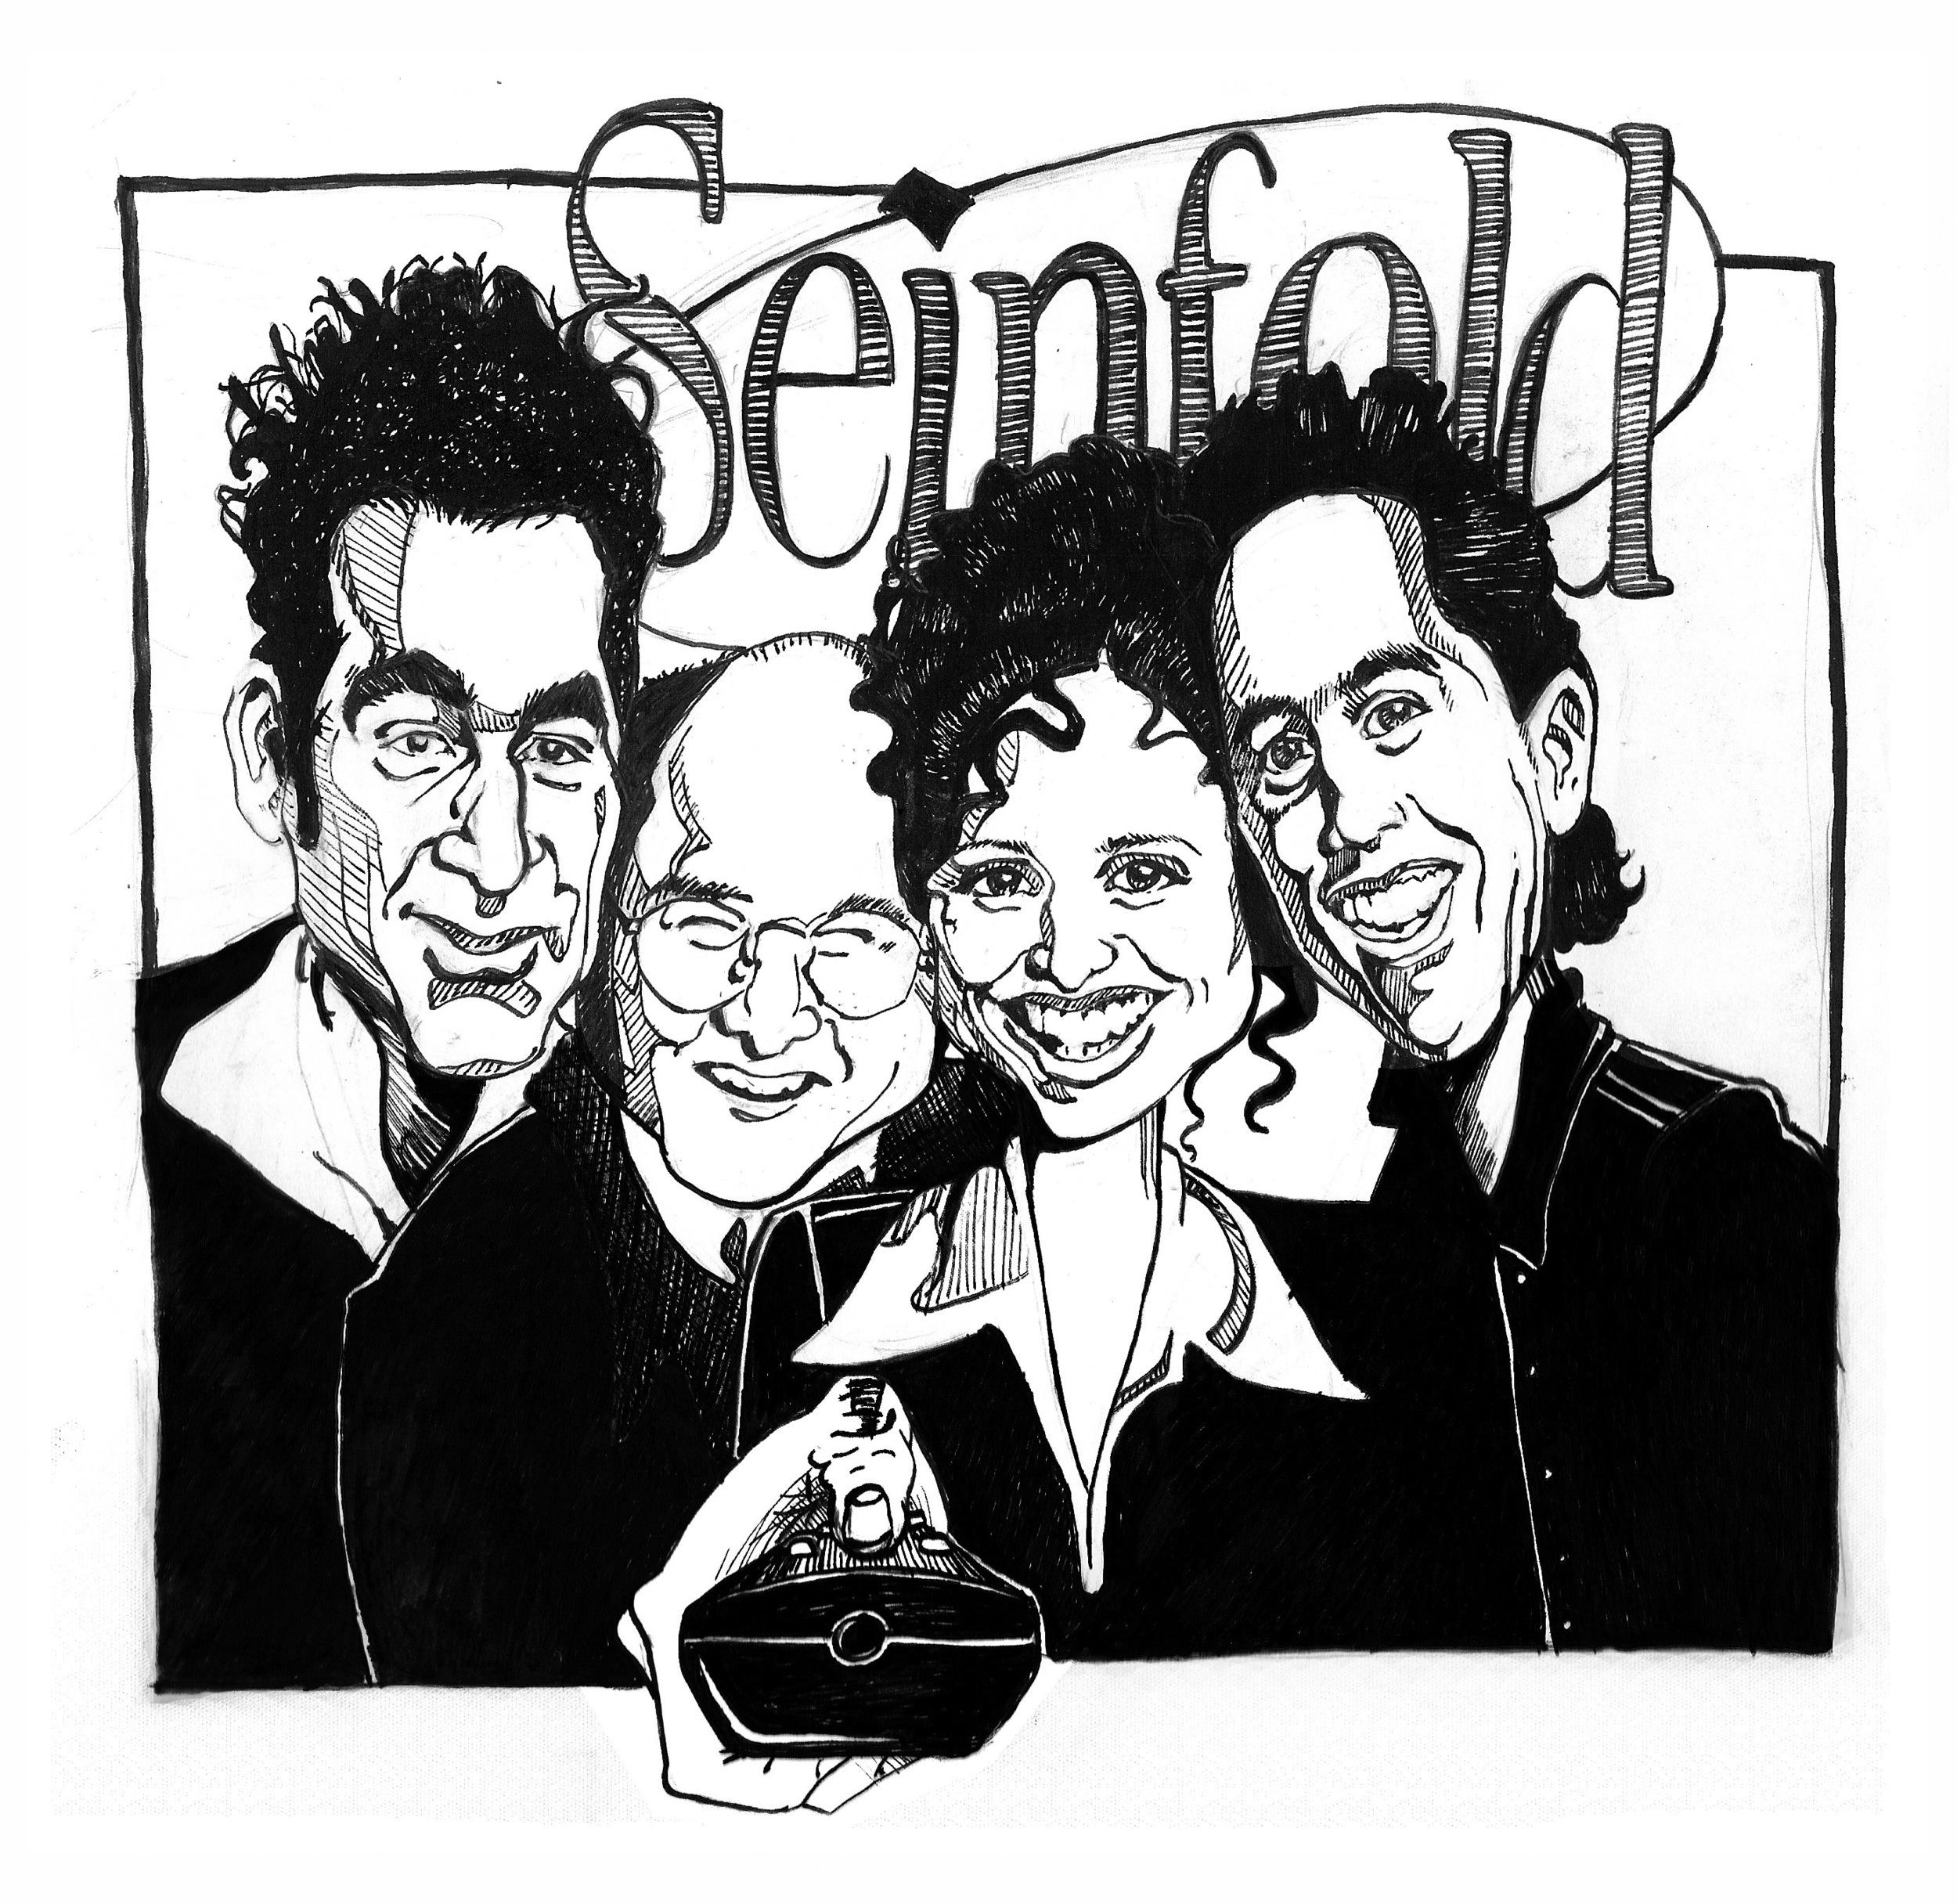 """Seinfeld Caricature""   Pen on Paper"